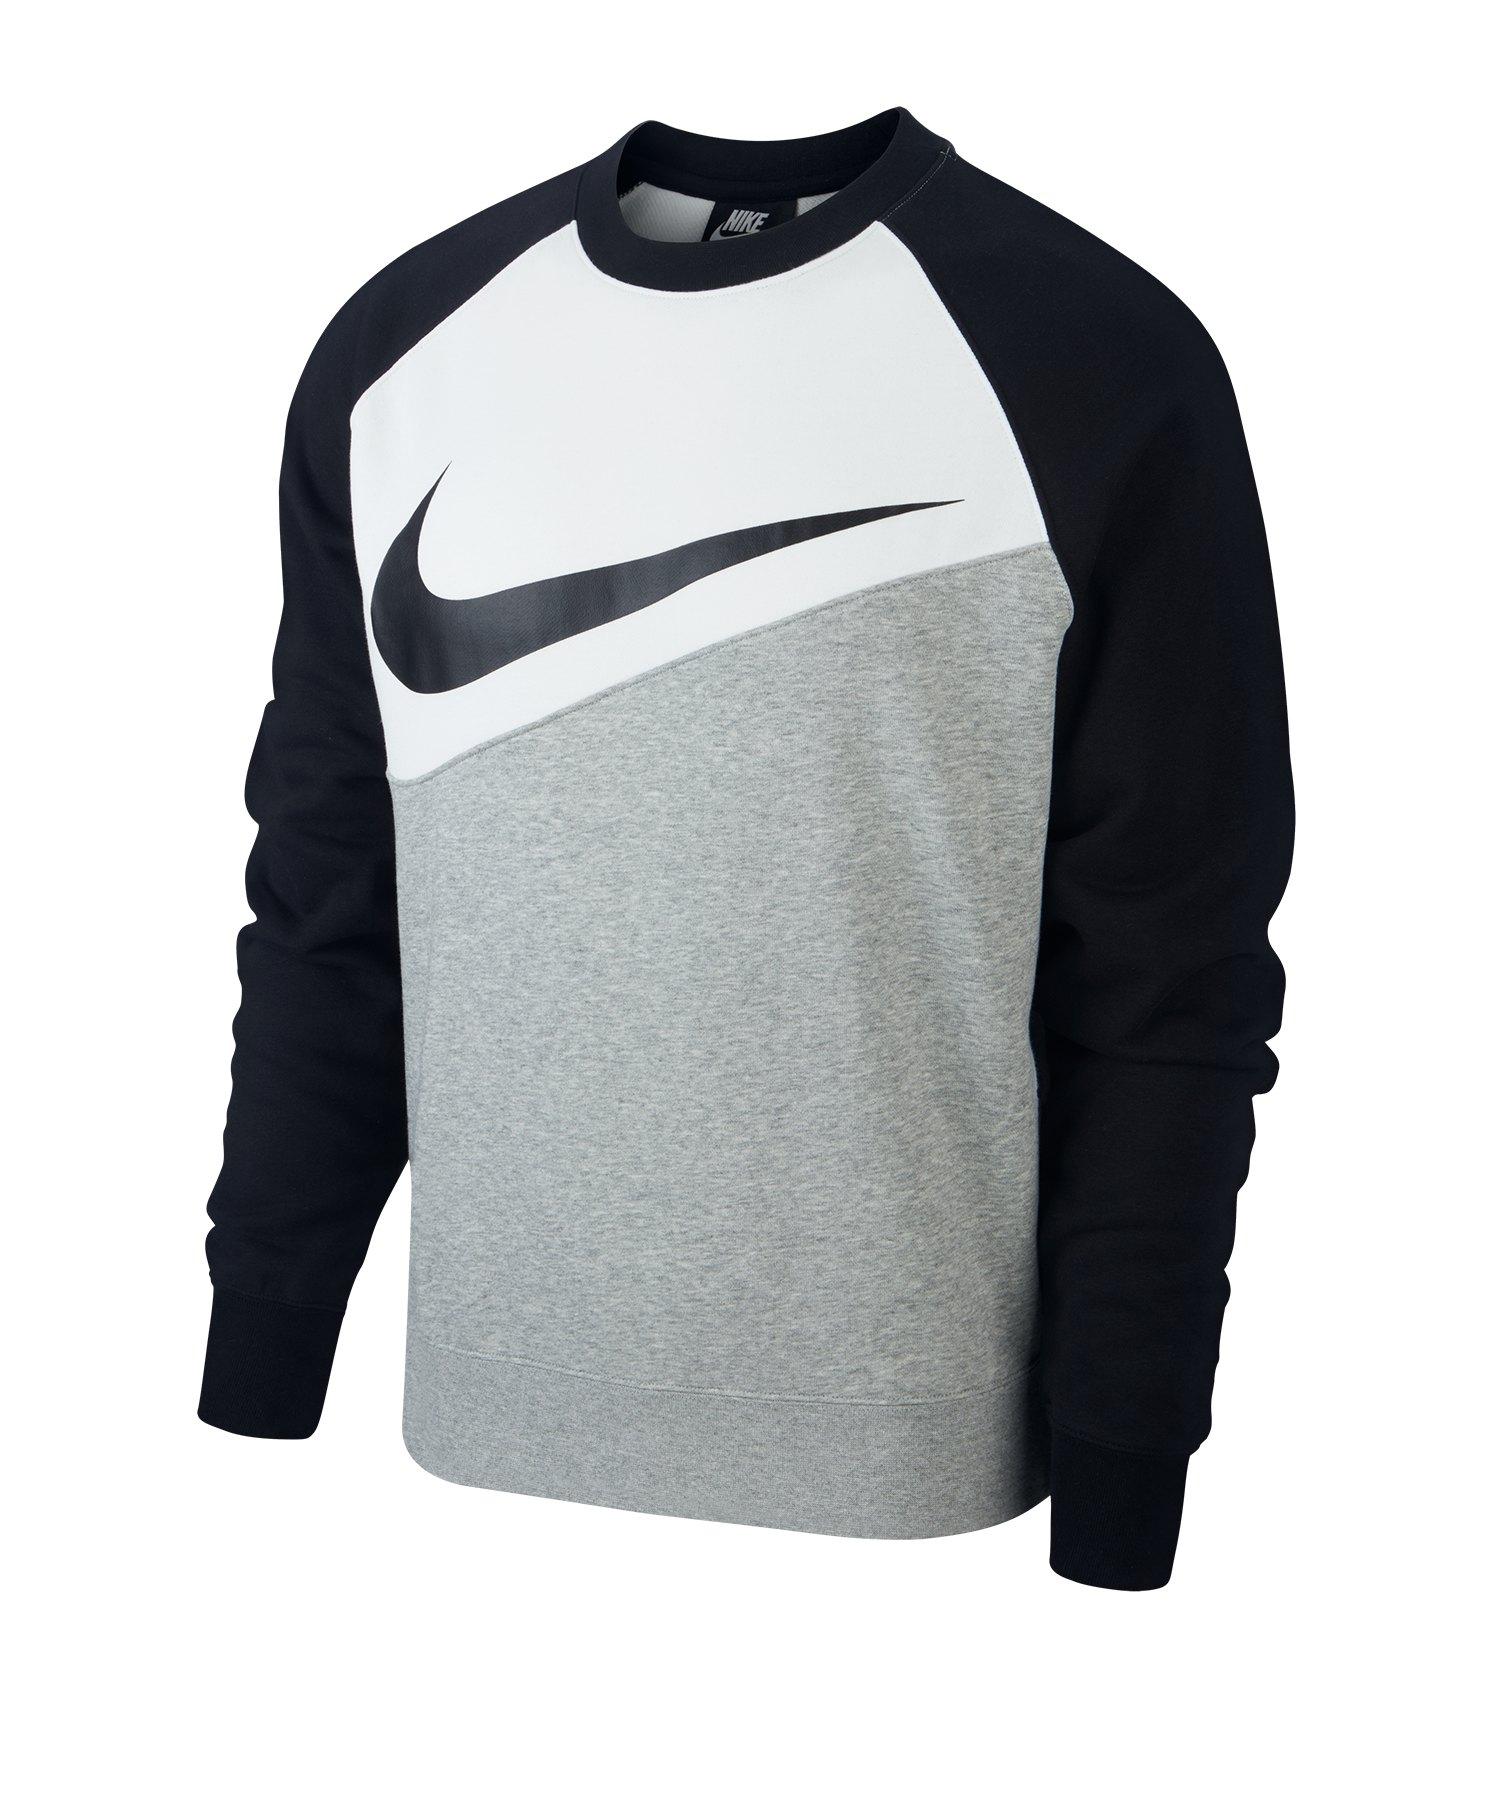 Nike Swoosh French Terry Crew Langarmshirt F064 - grau